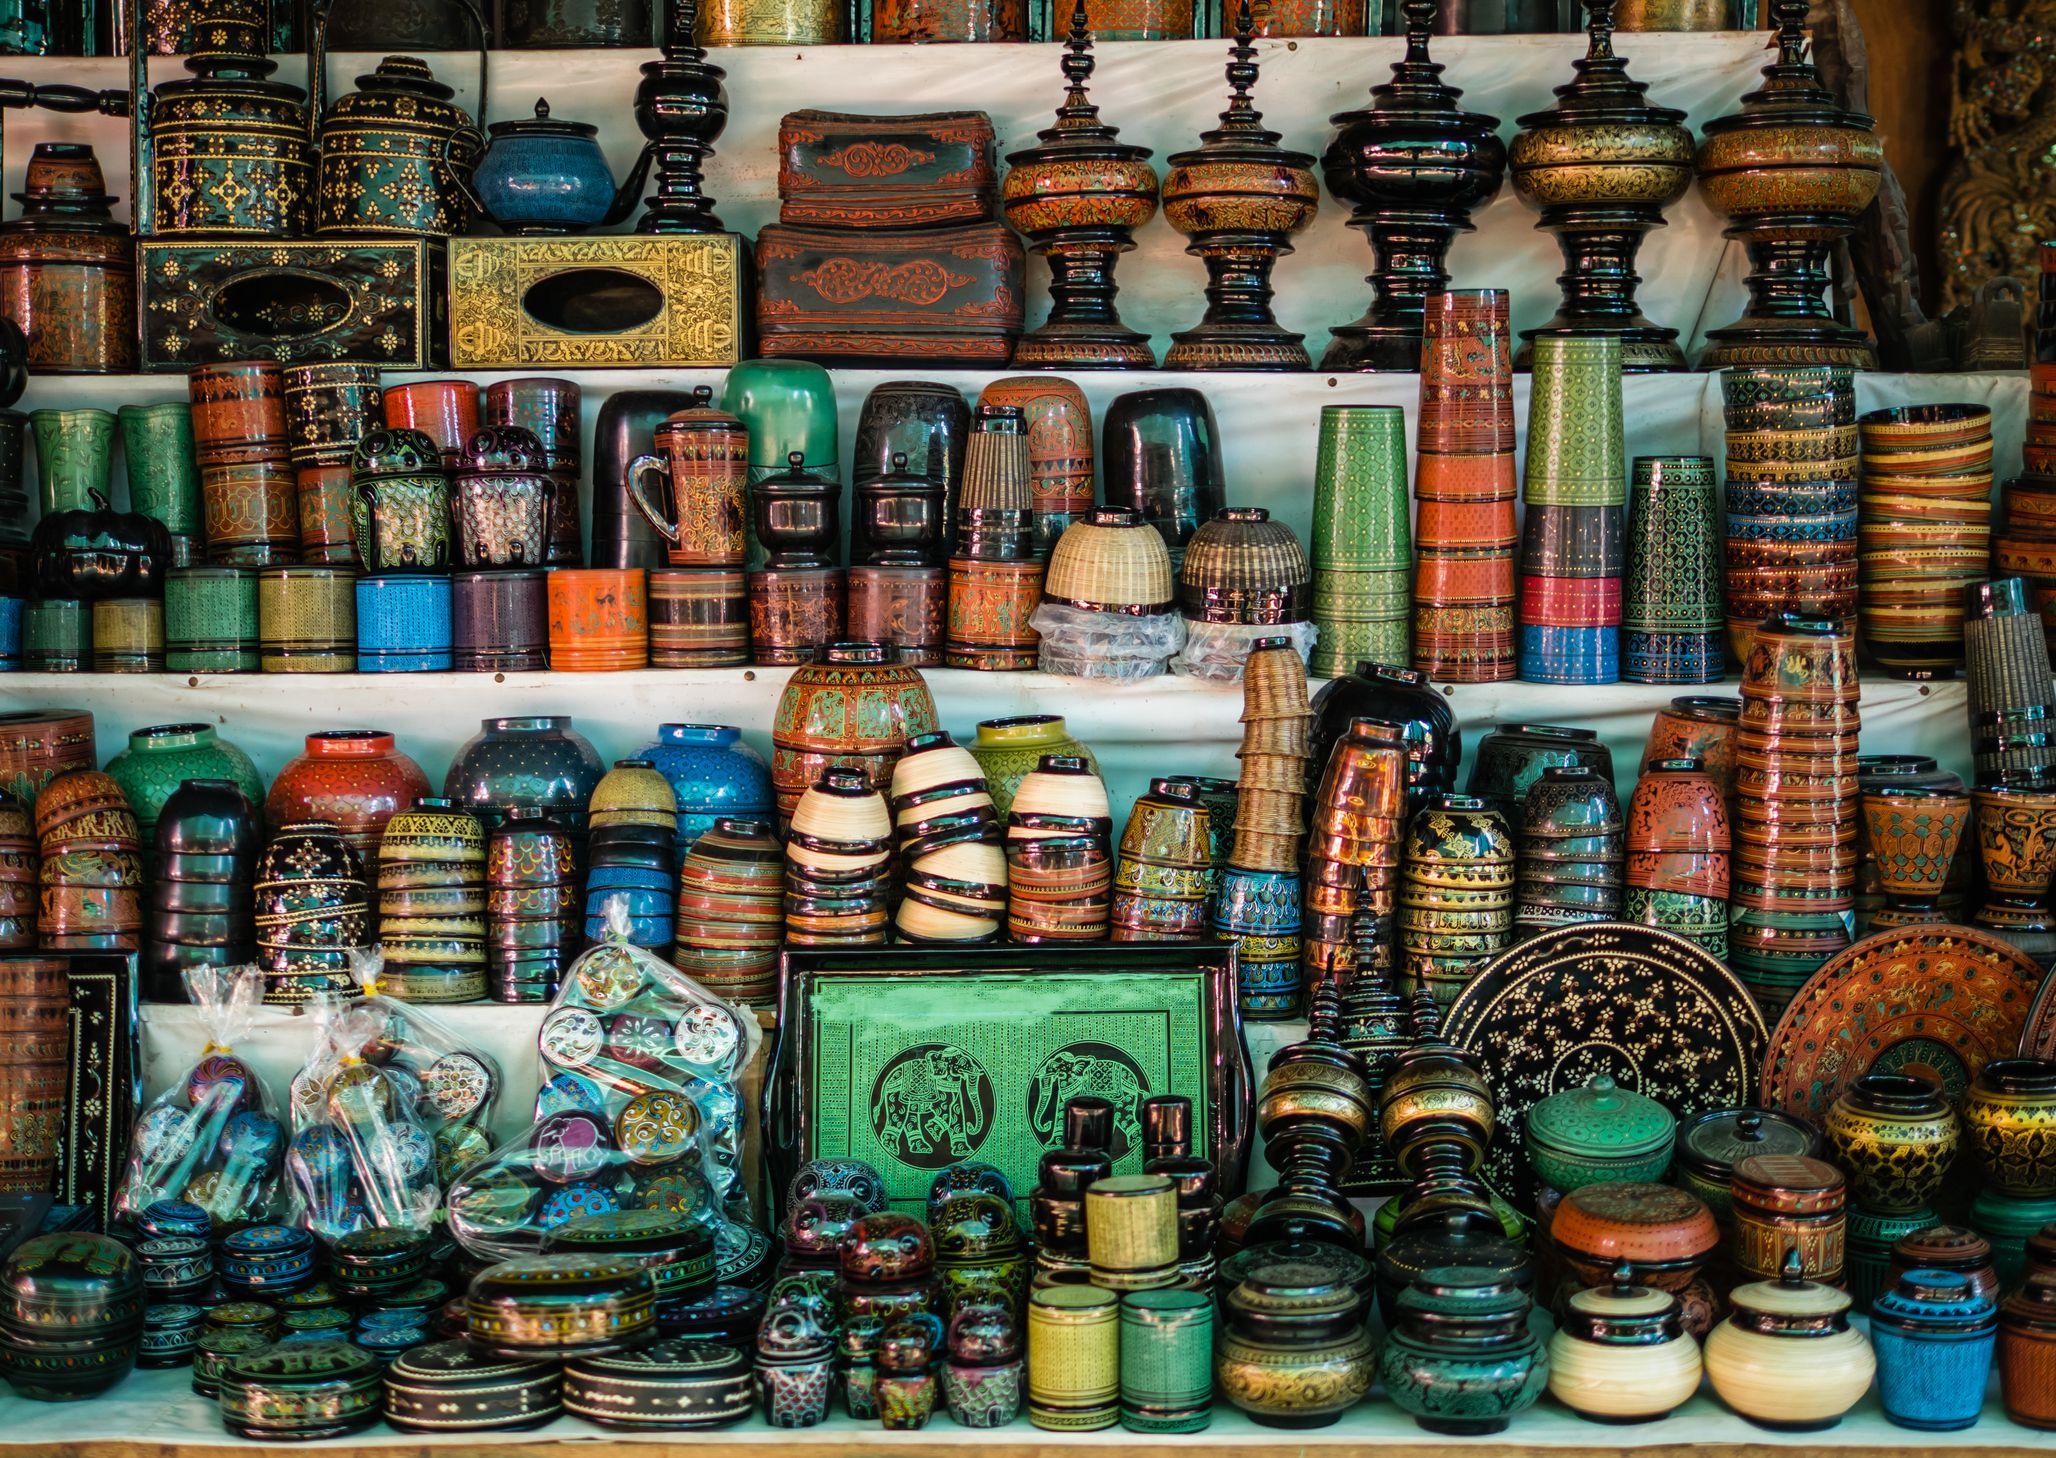 Lacquerware souvenir selling at Mani Sithu Market